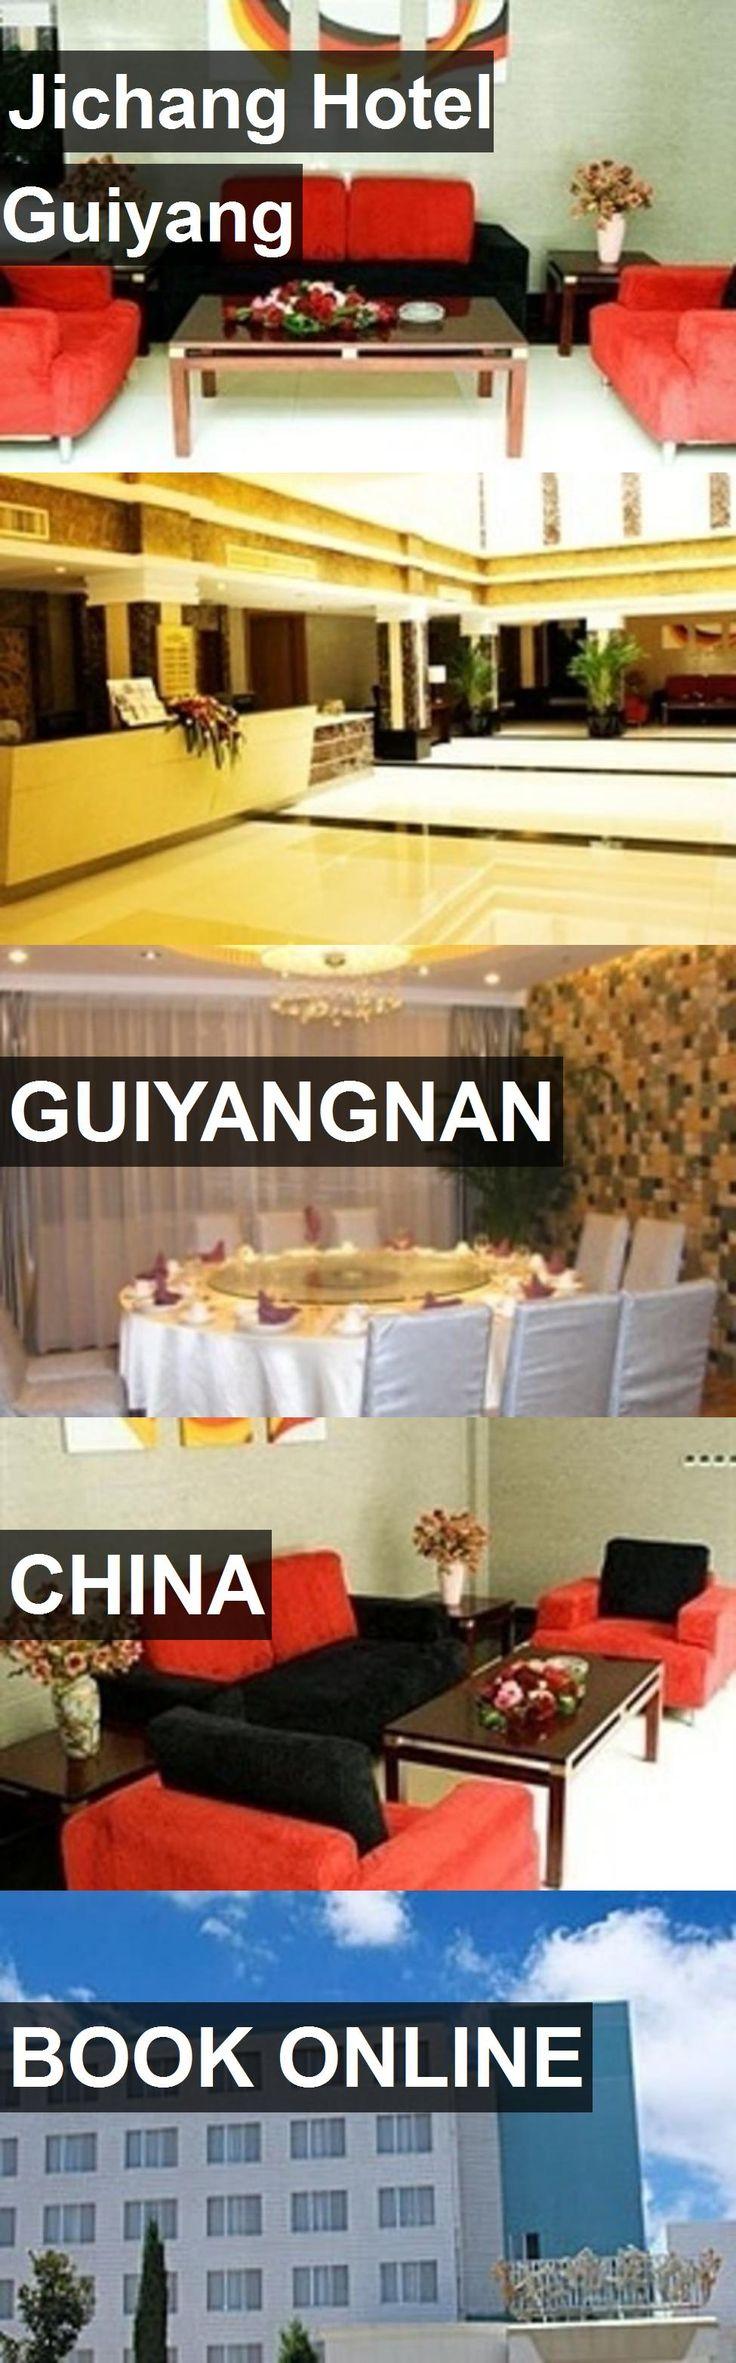 Jichang Hotel Guiyang in Guiyangnan, China. For more information, photos, reviews and best prices please follow the link. #China #Guiyangnan #travel #vacation #hotel